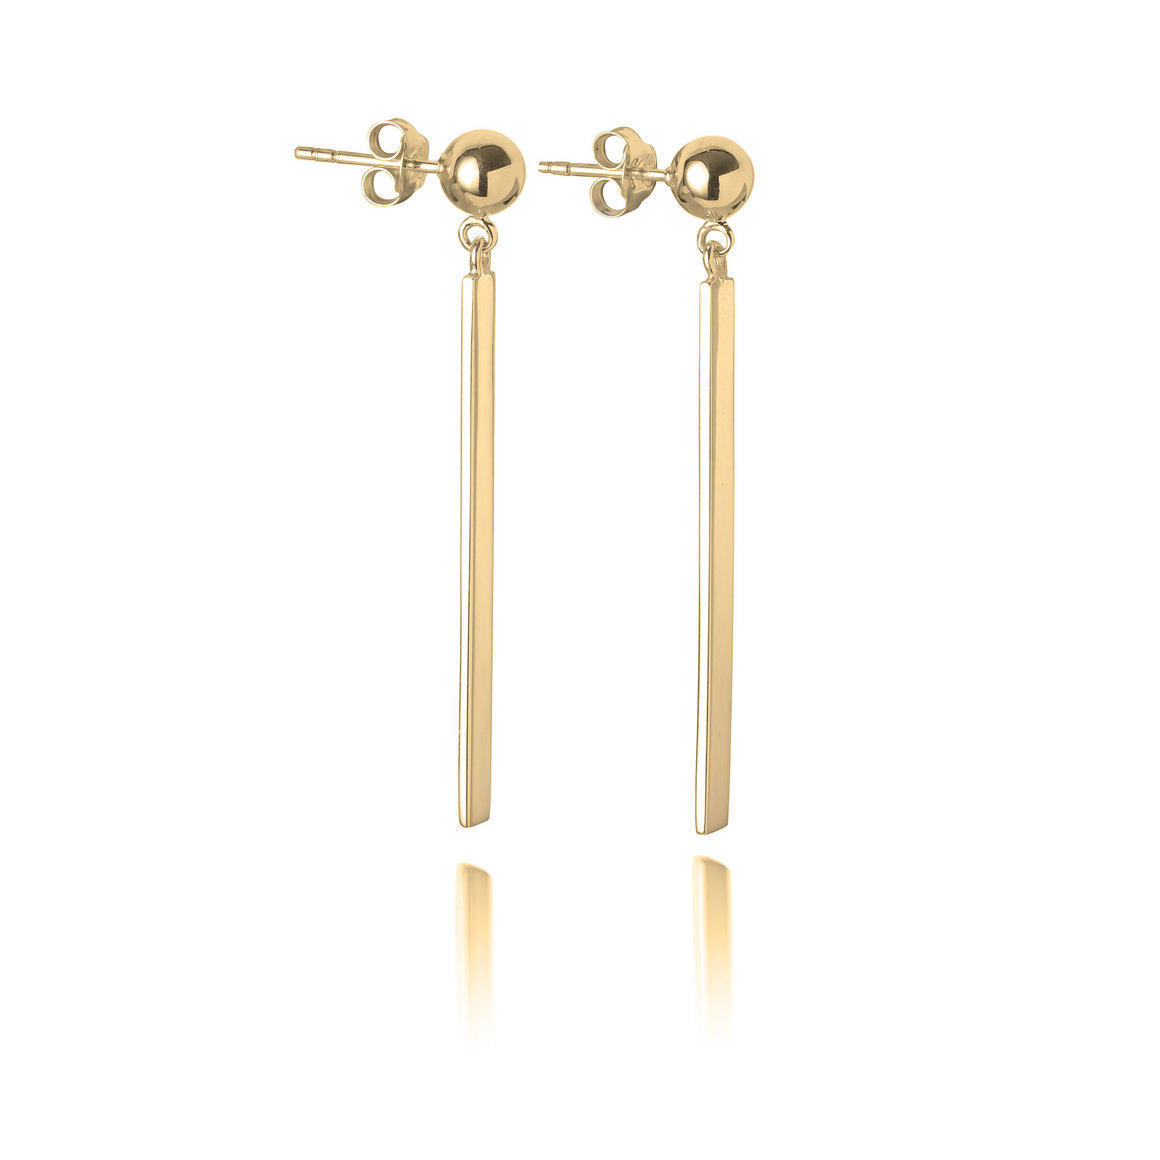 Ball & Bar Earrings | Trada Marketplace